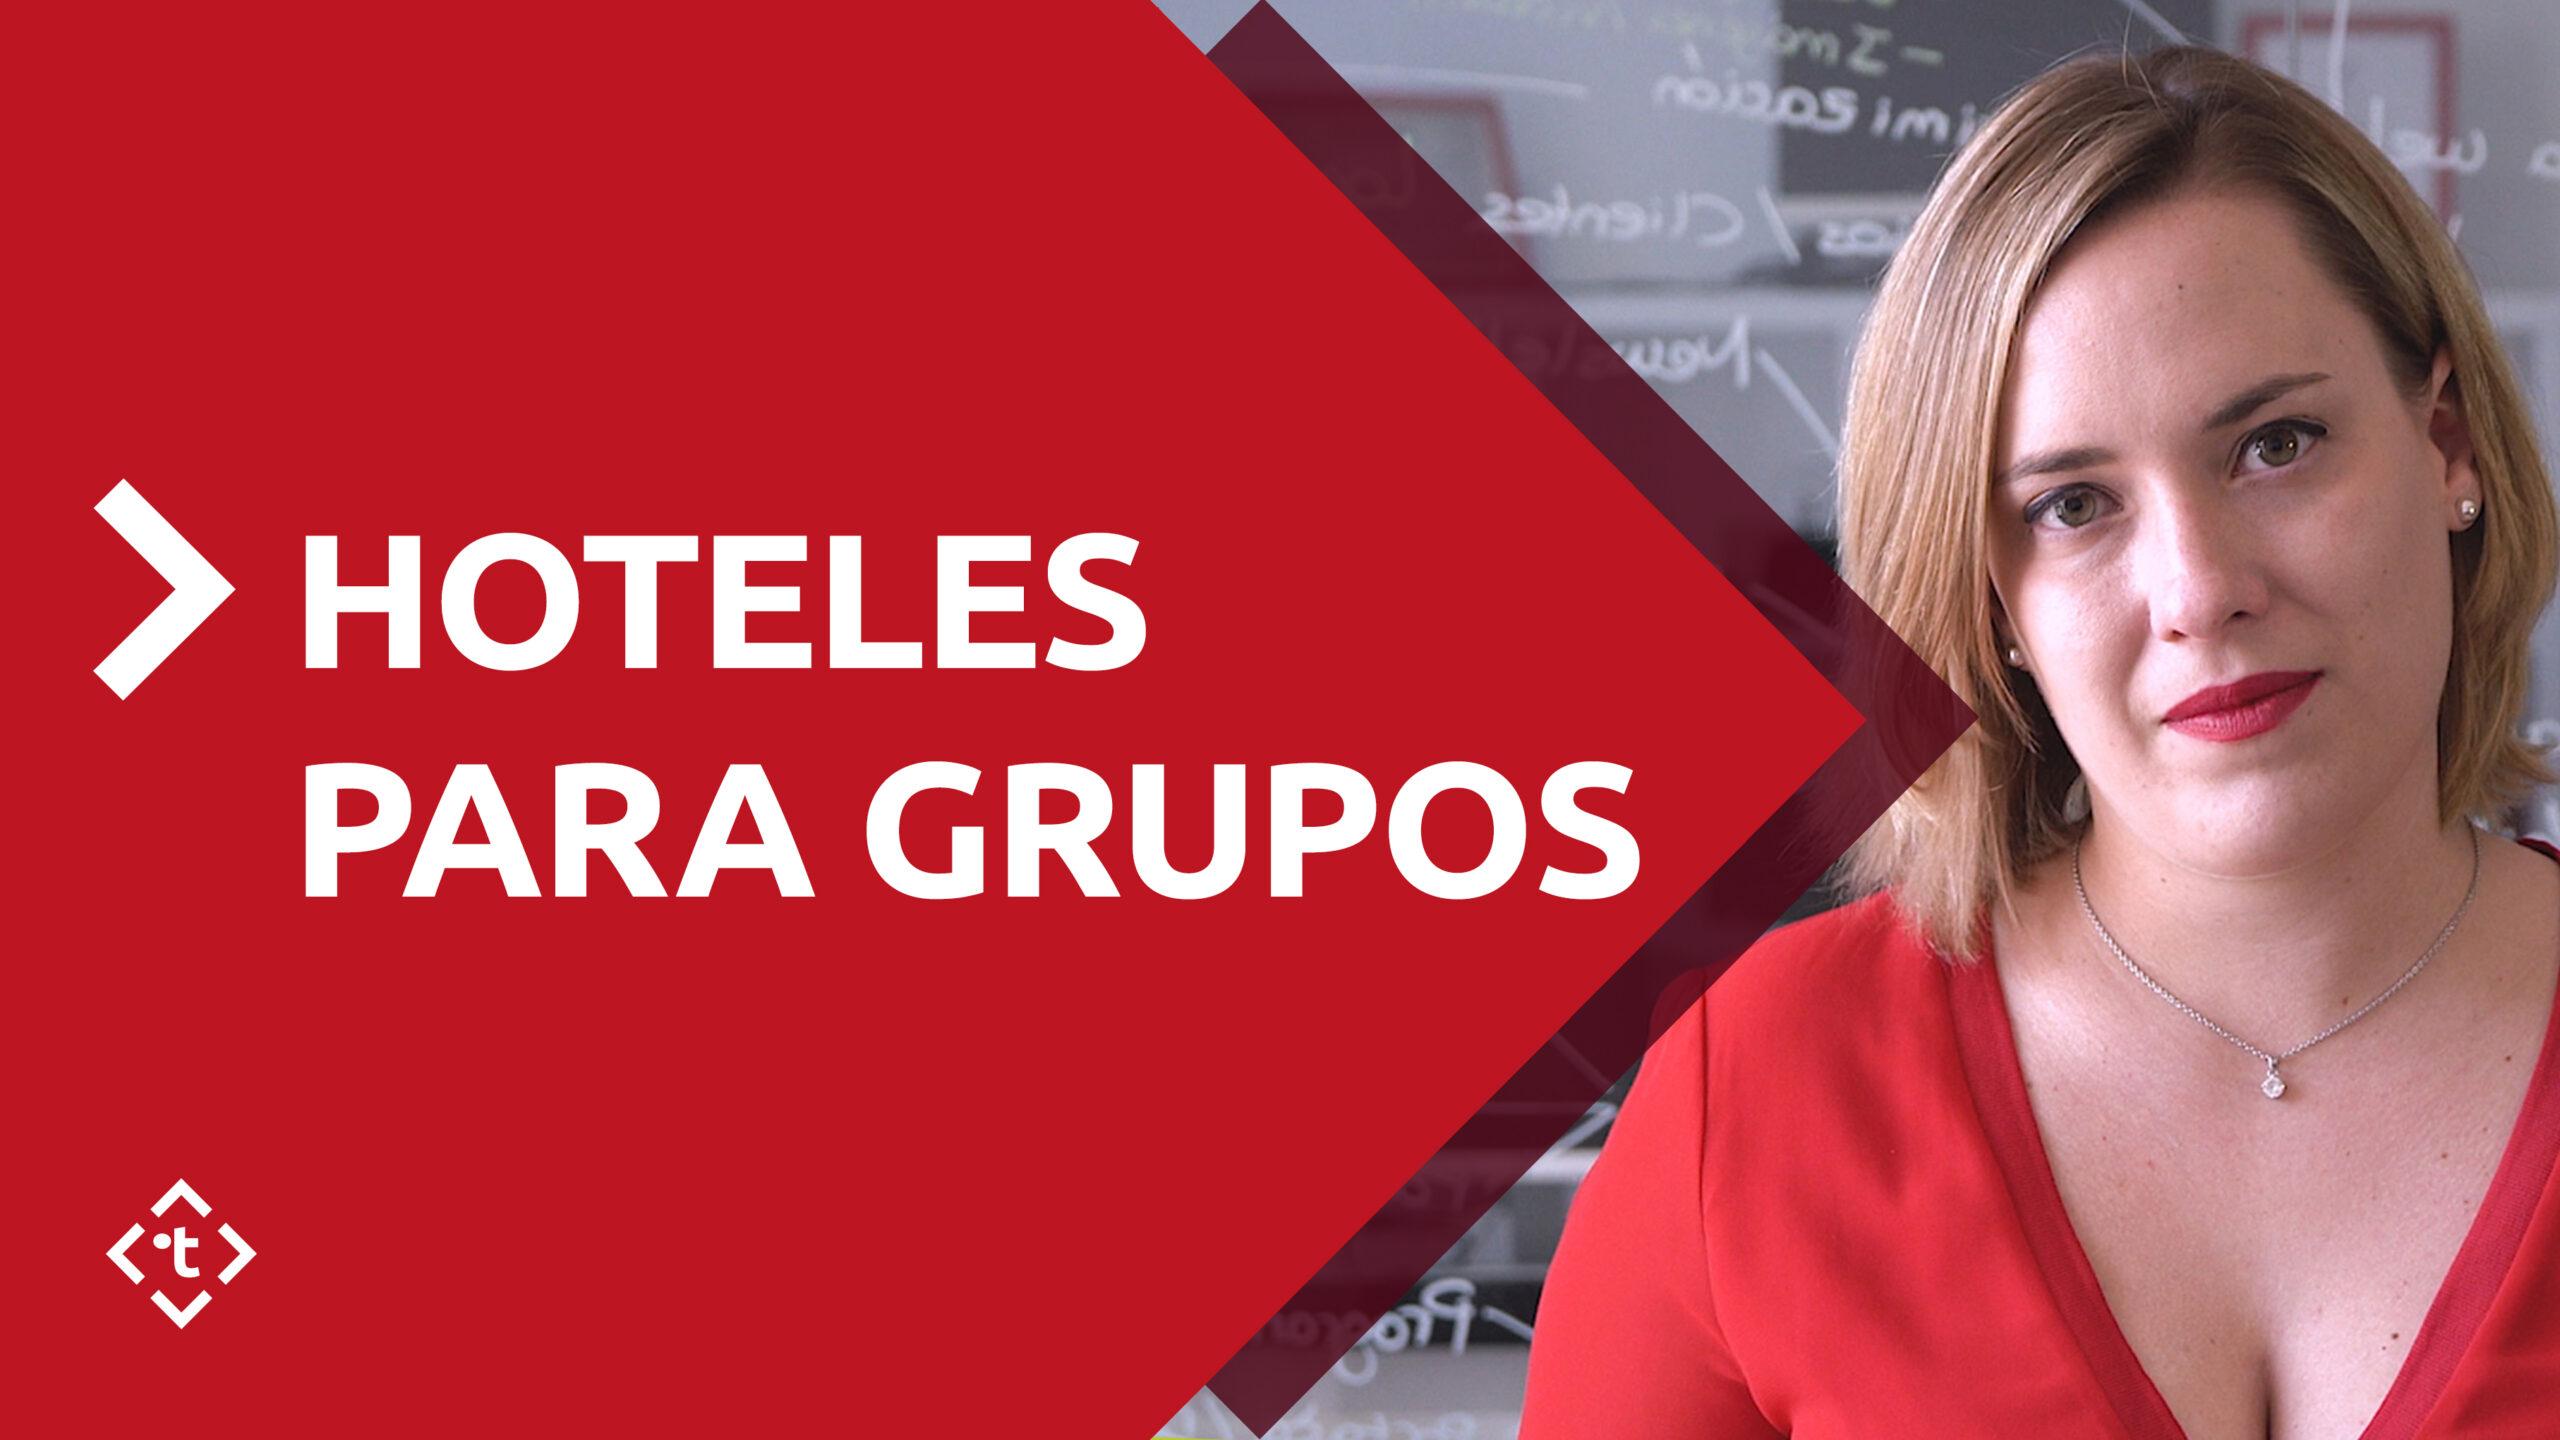 HOTELES PARA GRUPOS